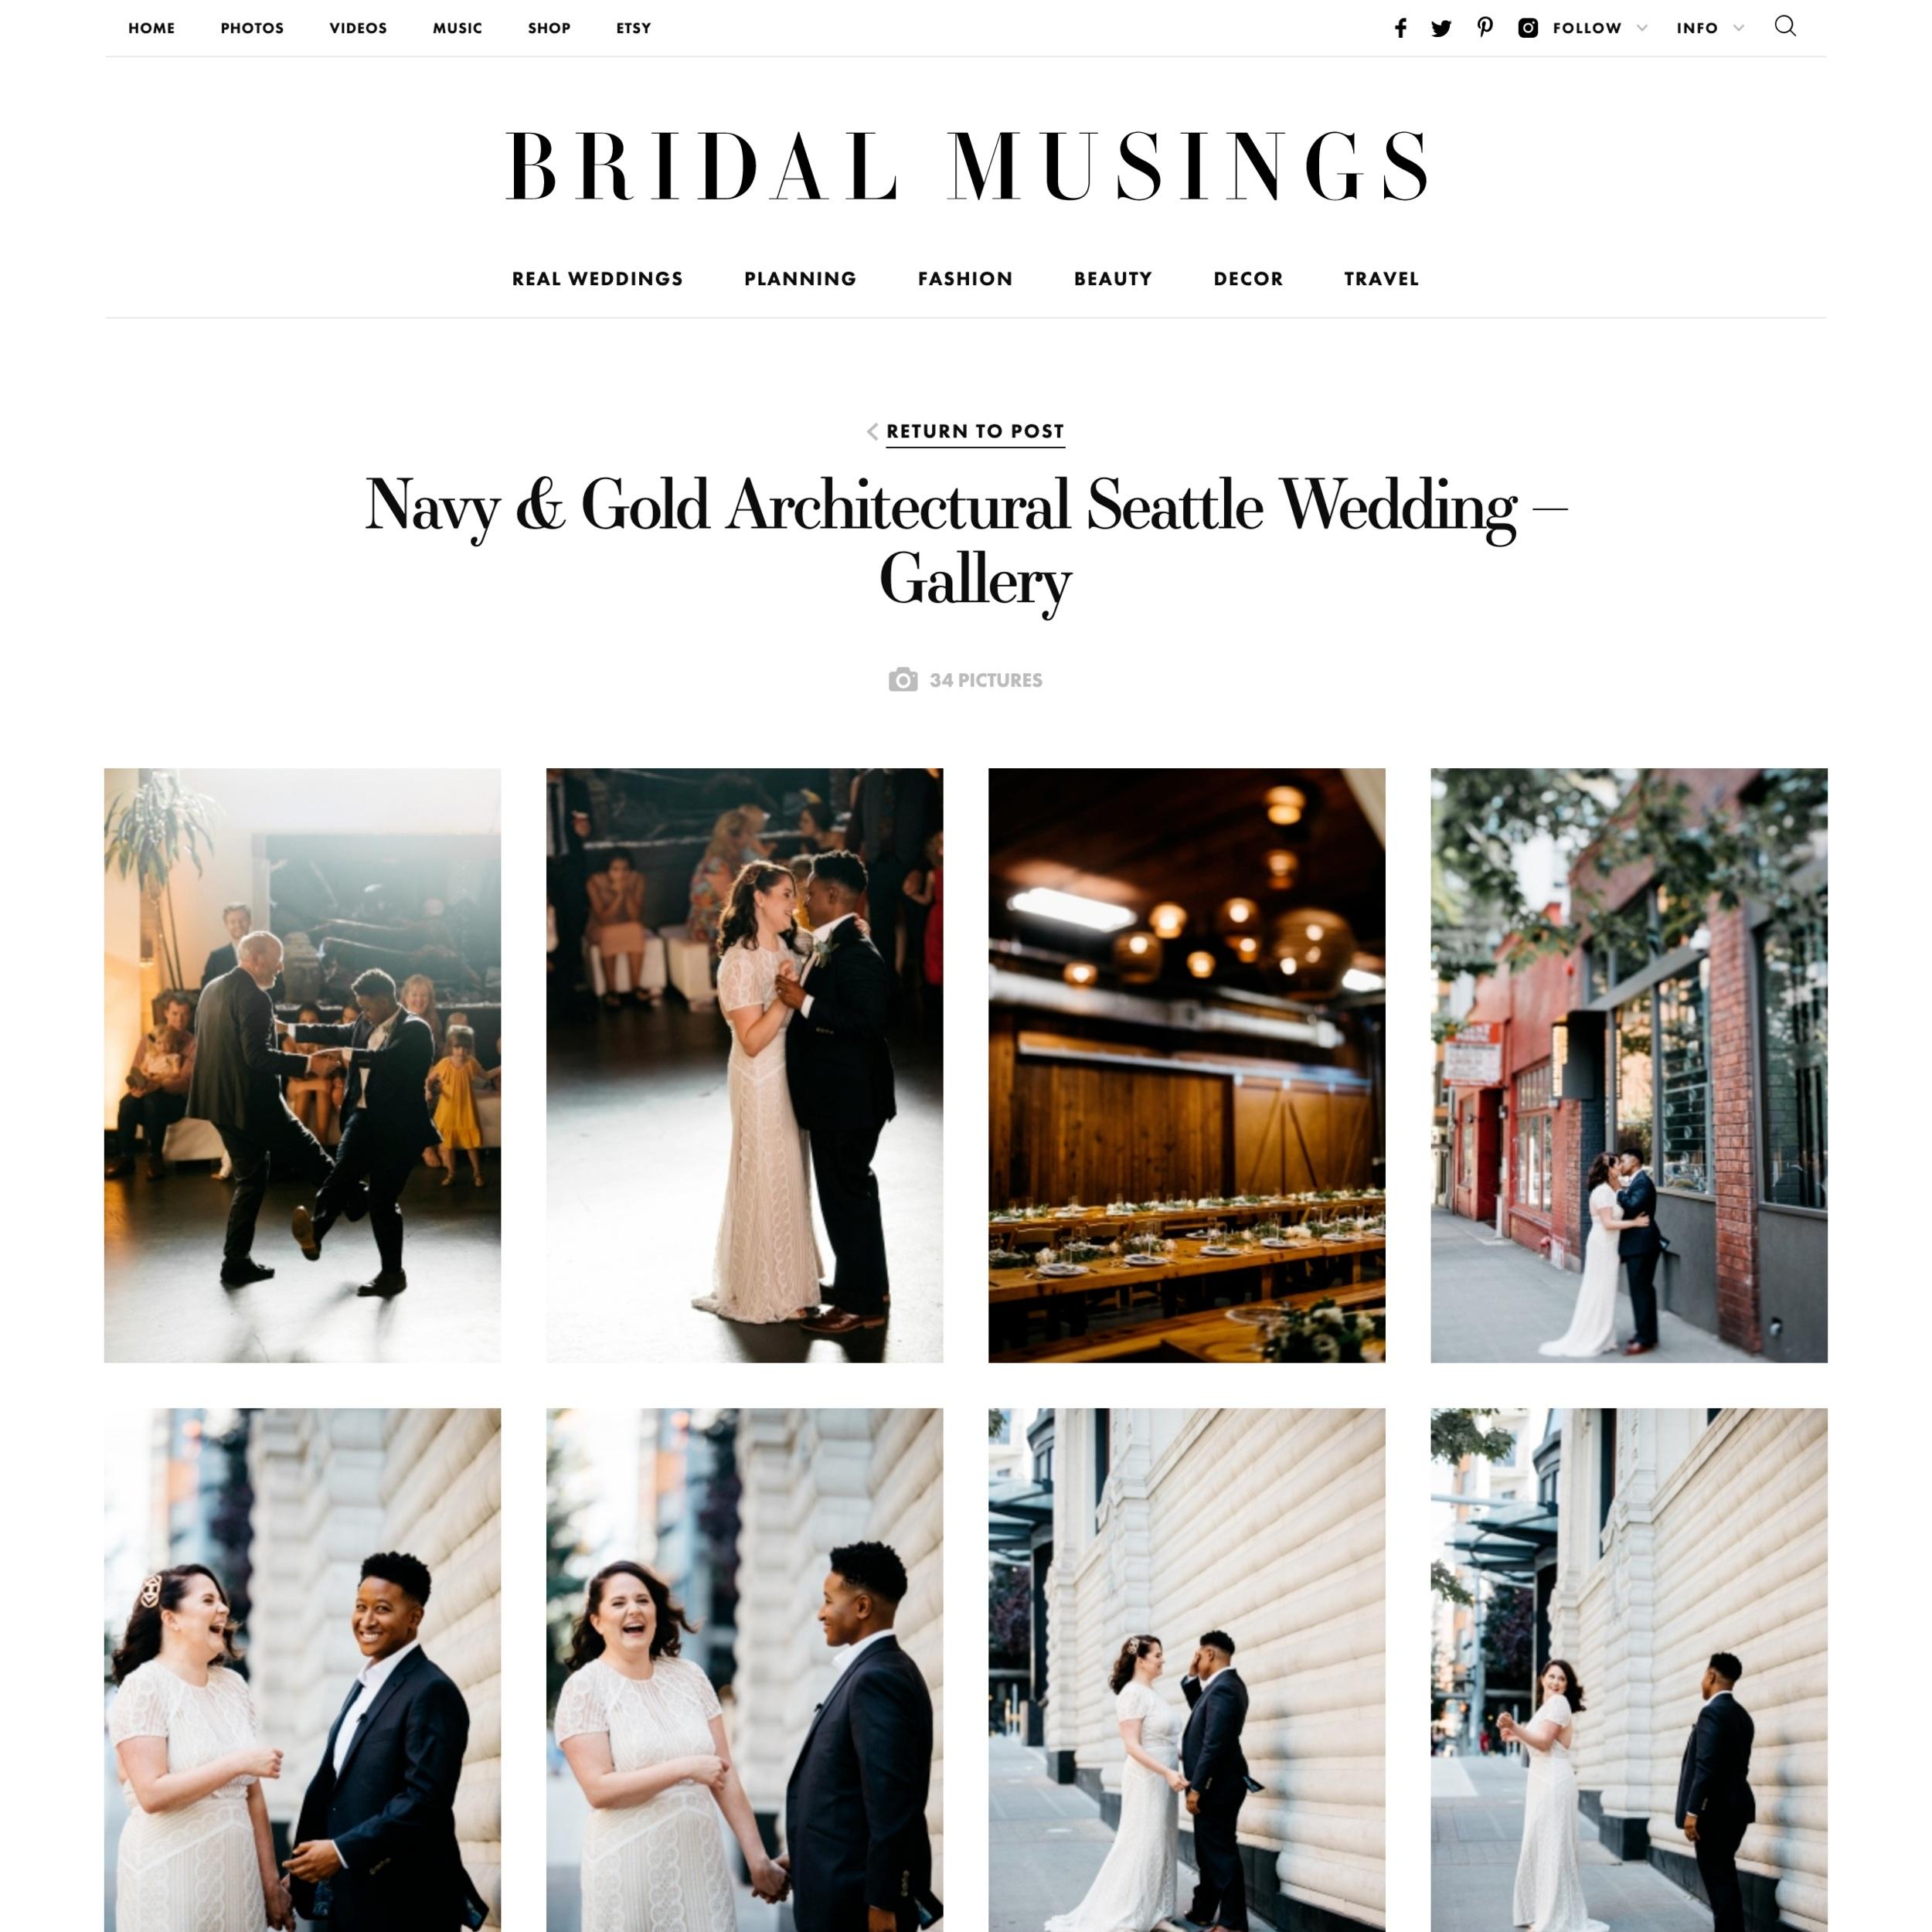 Jenna & Meridan featured on Bridal Musings - see full write-up here